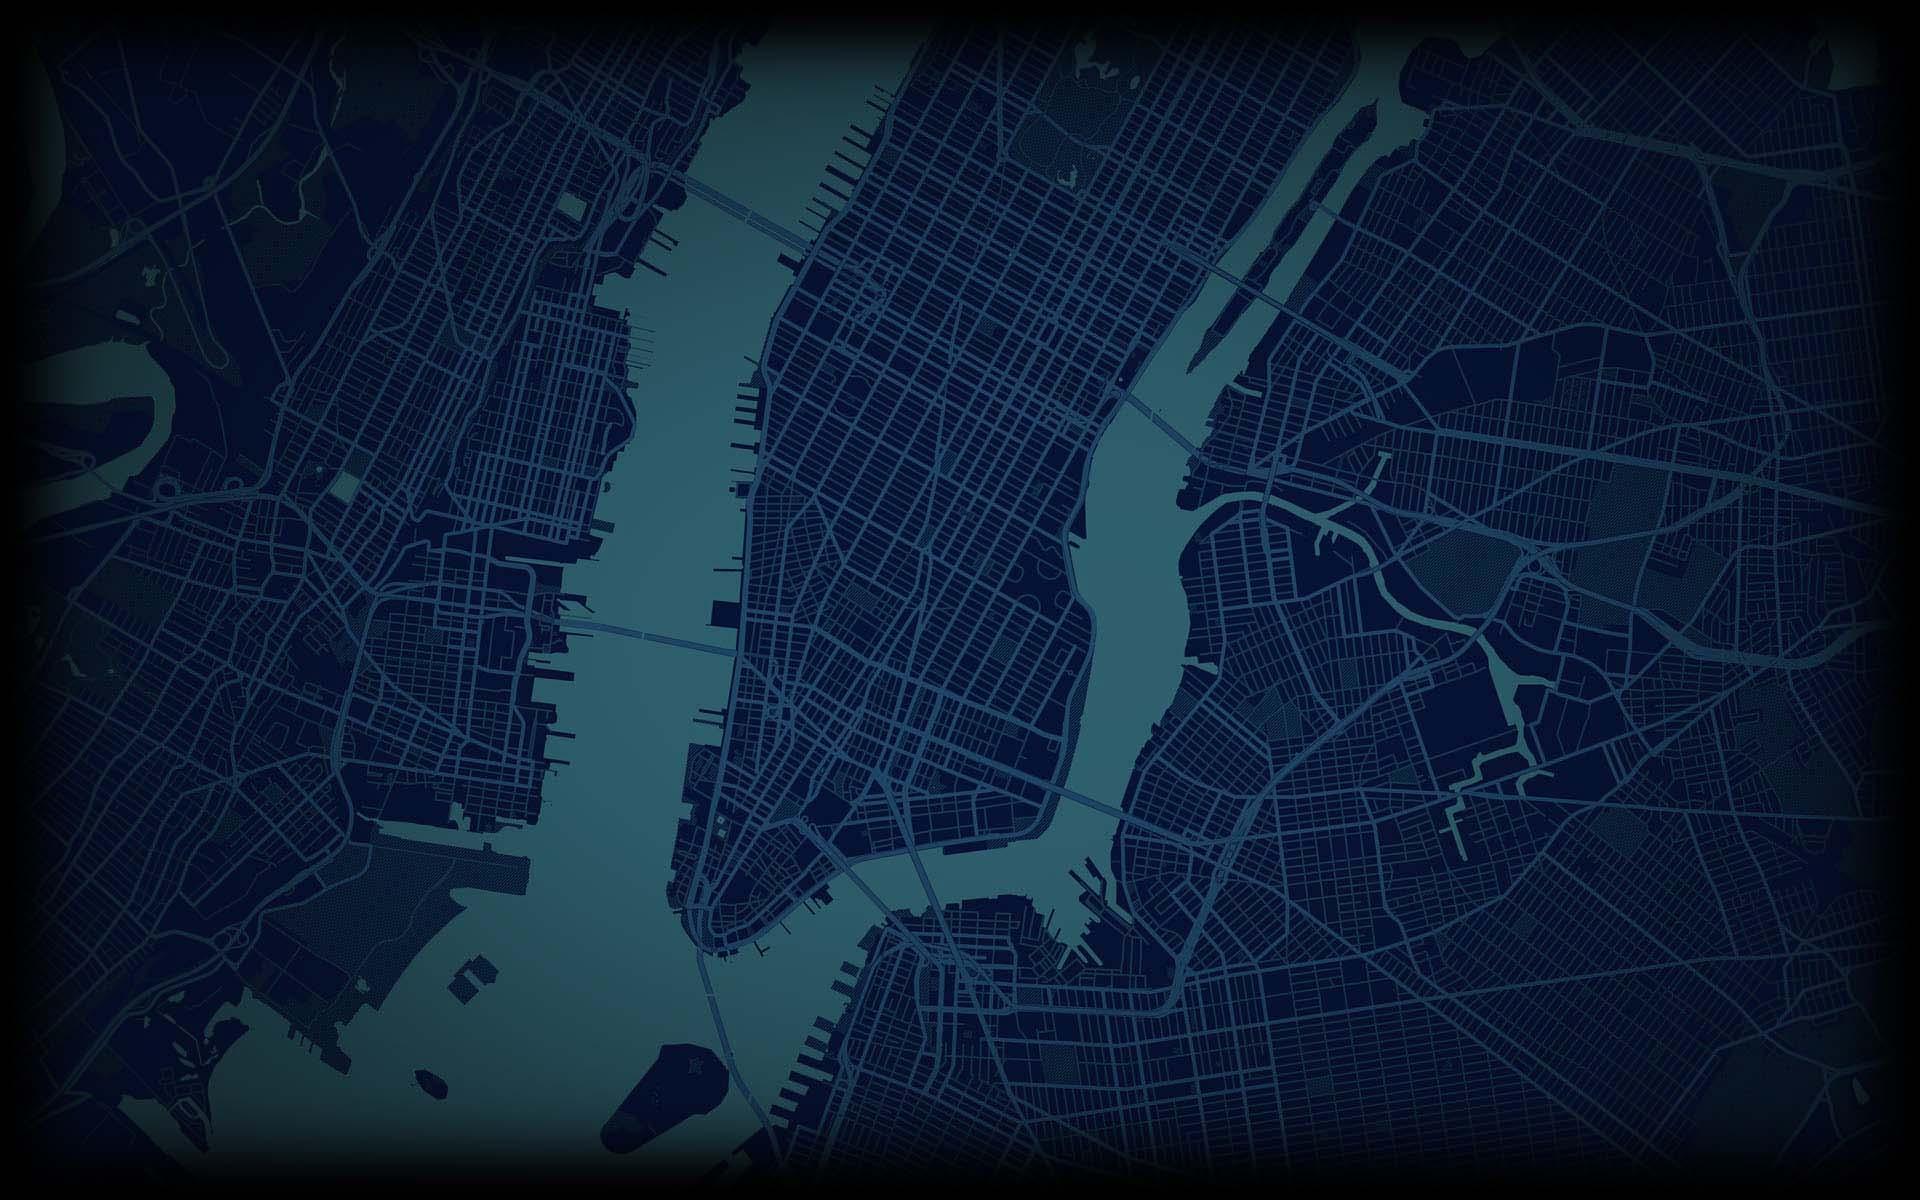 Steam Community Market Listings for 503560 New York City 1920x1200